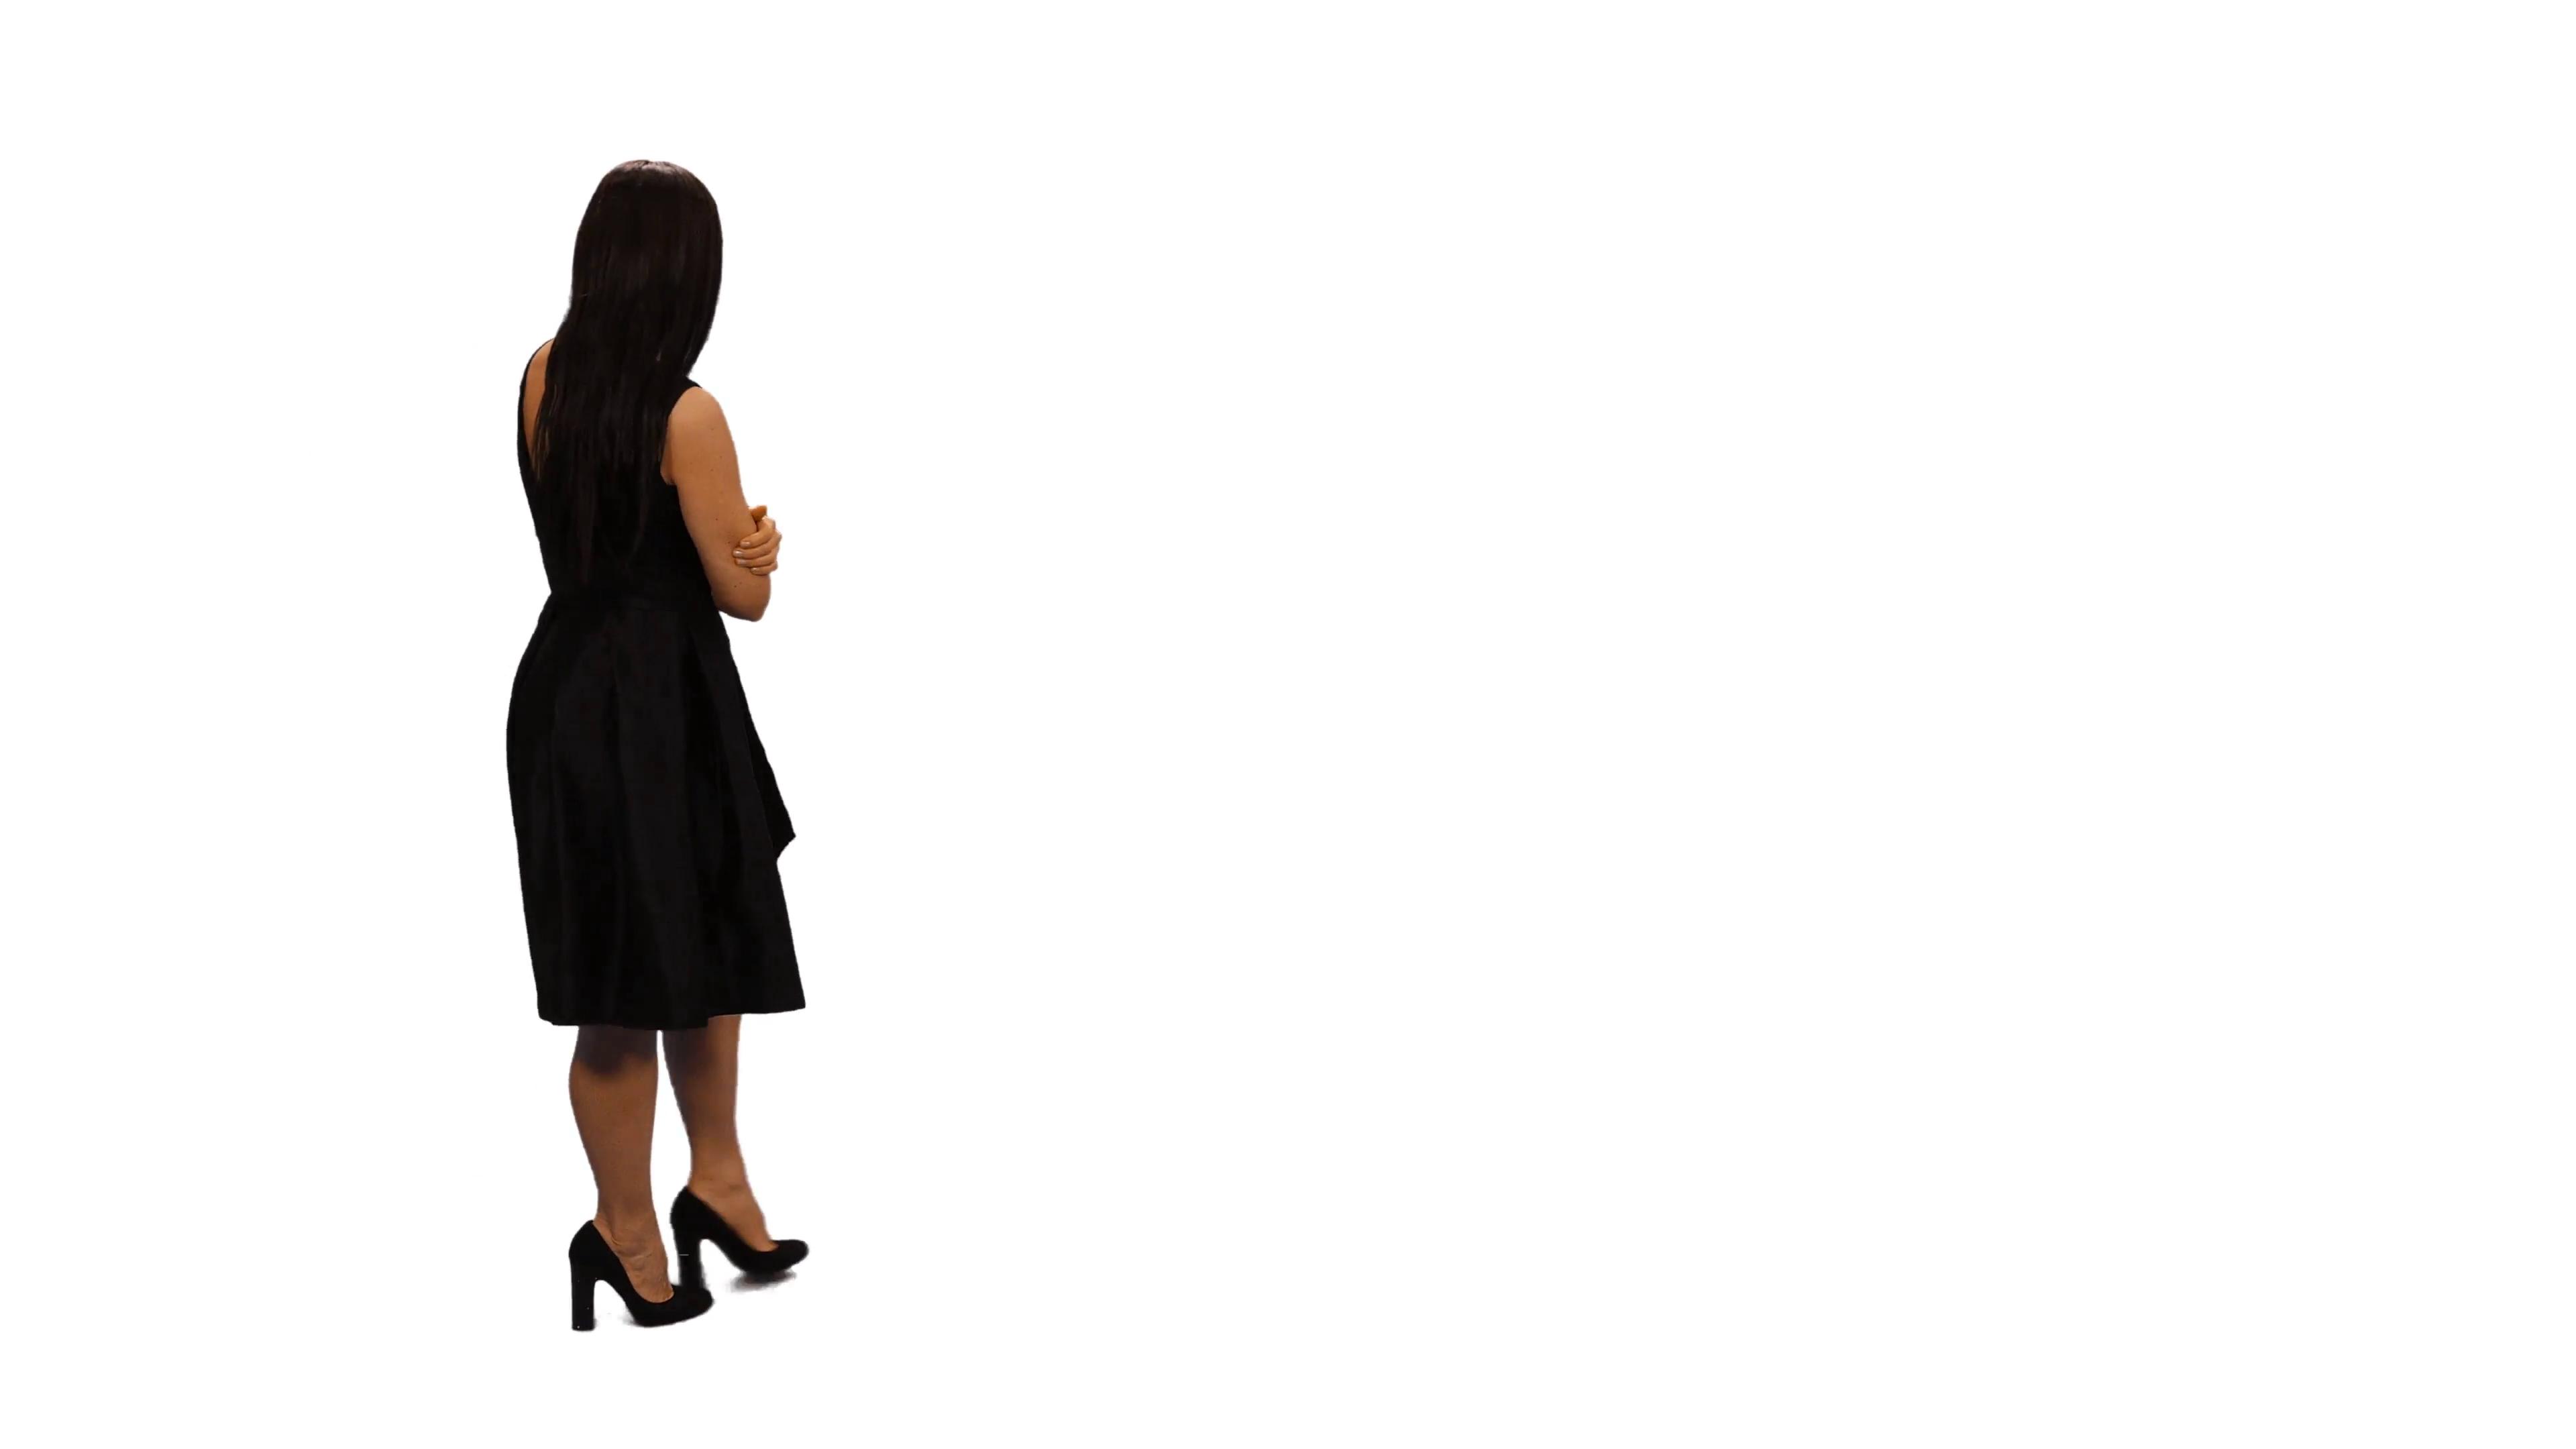 3840x2160 Back View Of An Elegant Young Woman Walking Amp Watching Something